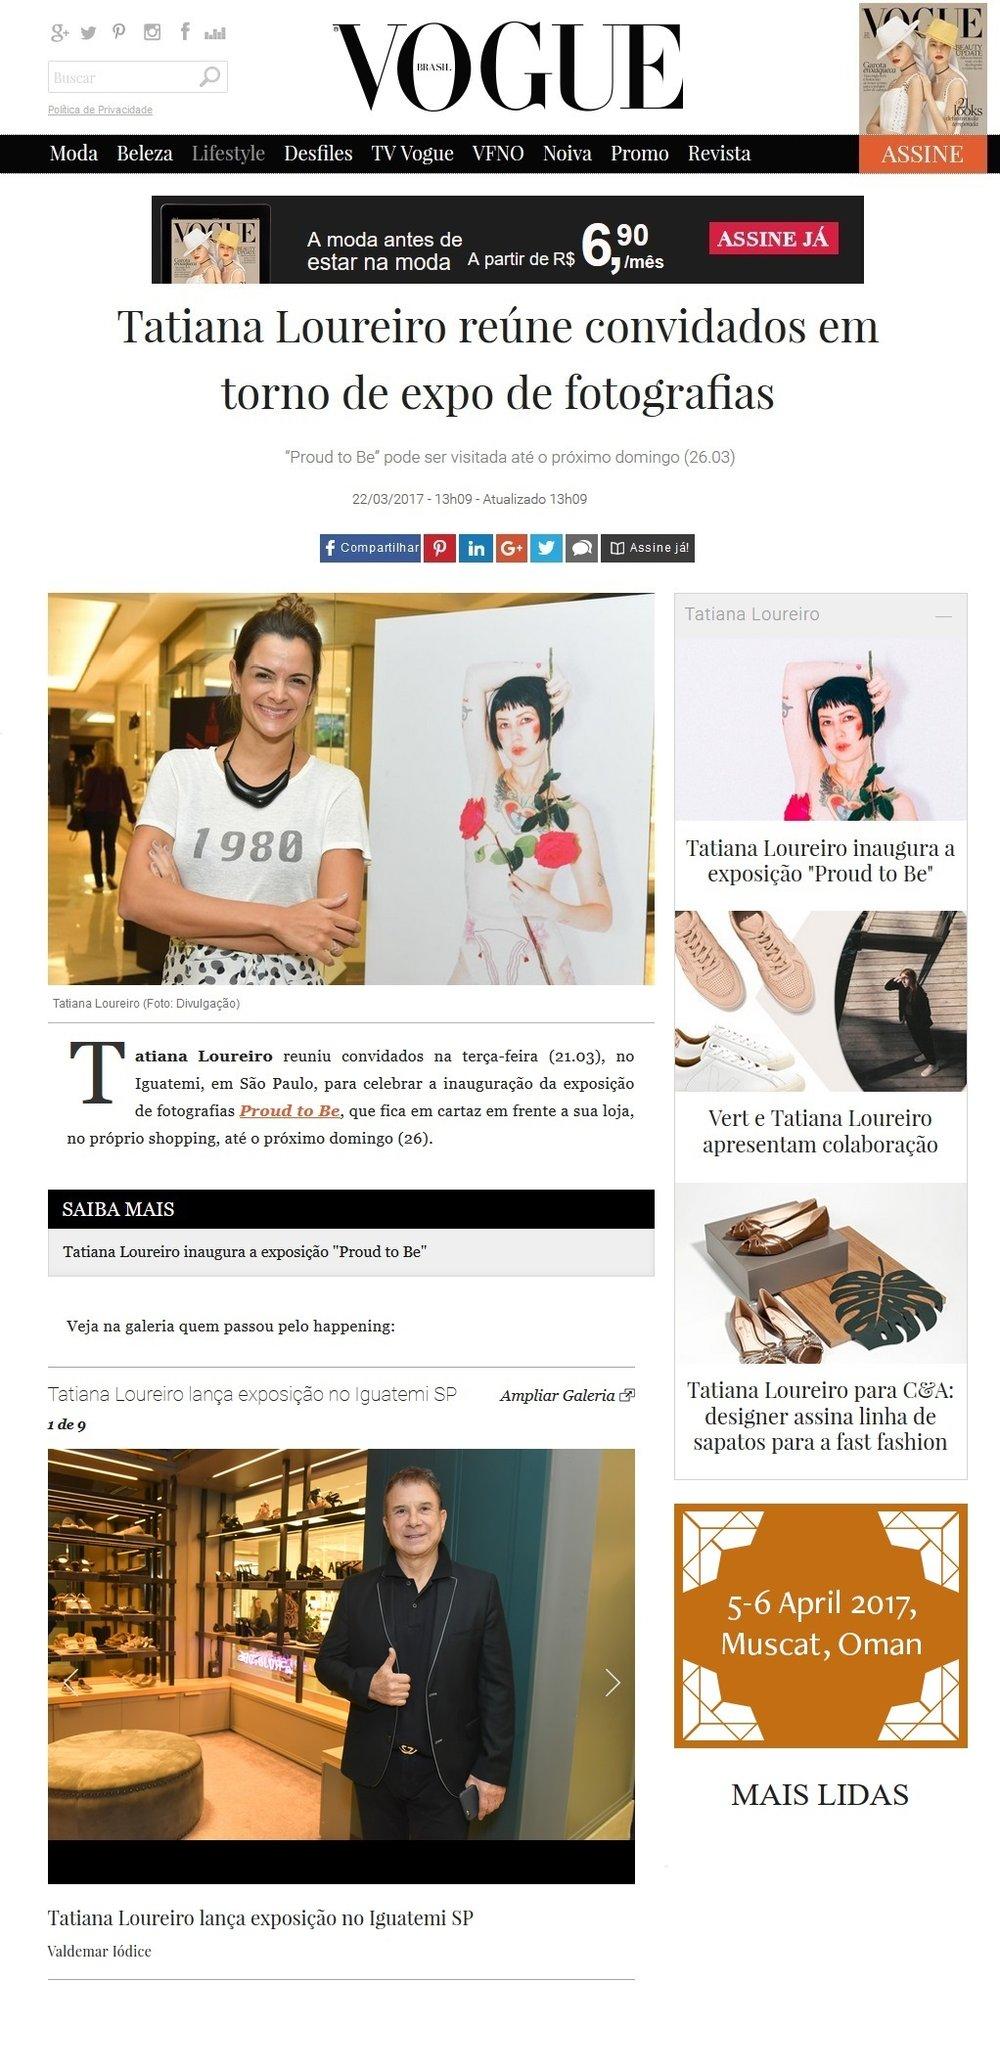 site Vogue ll.jpg